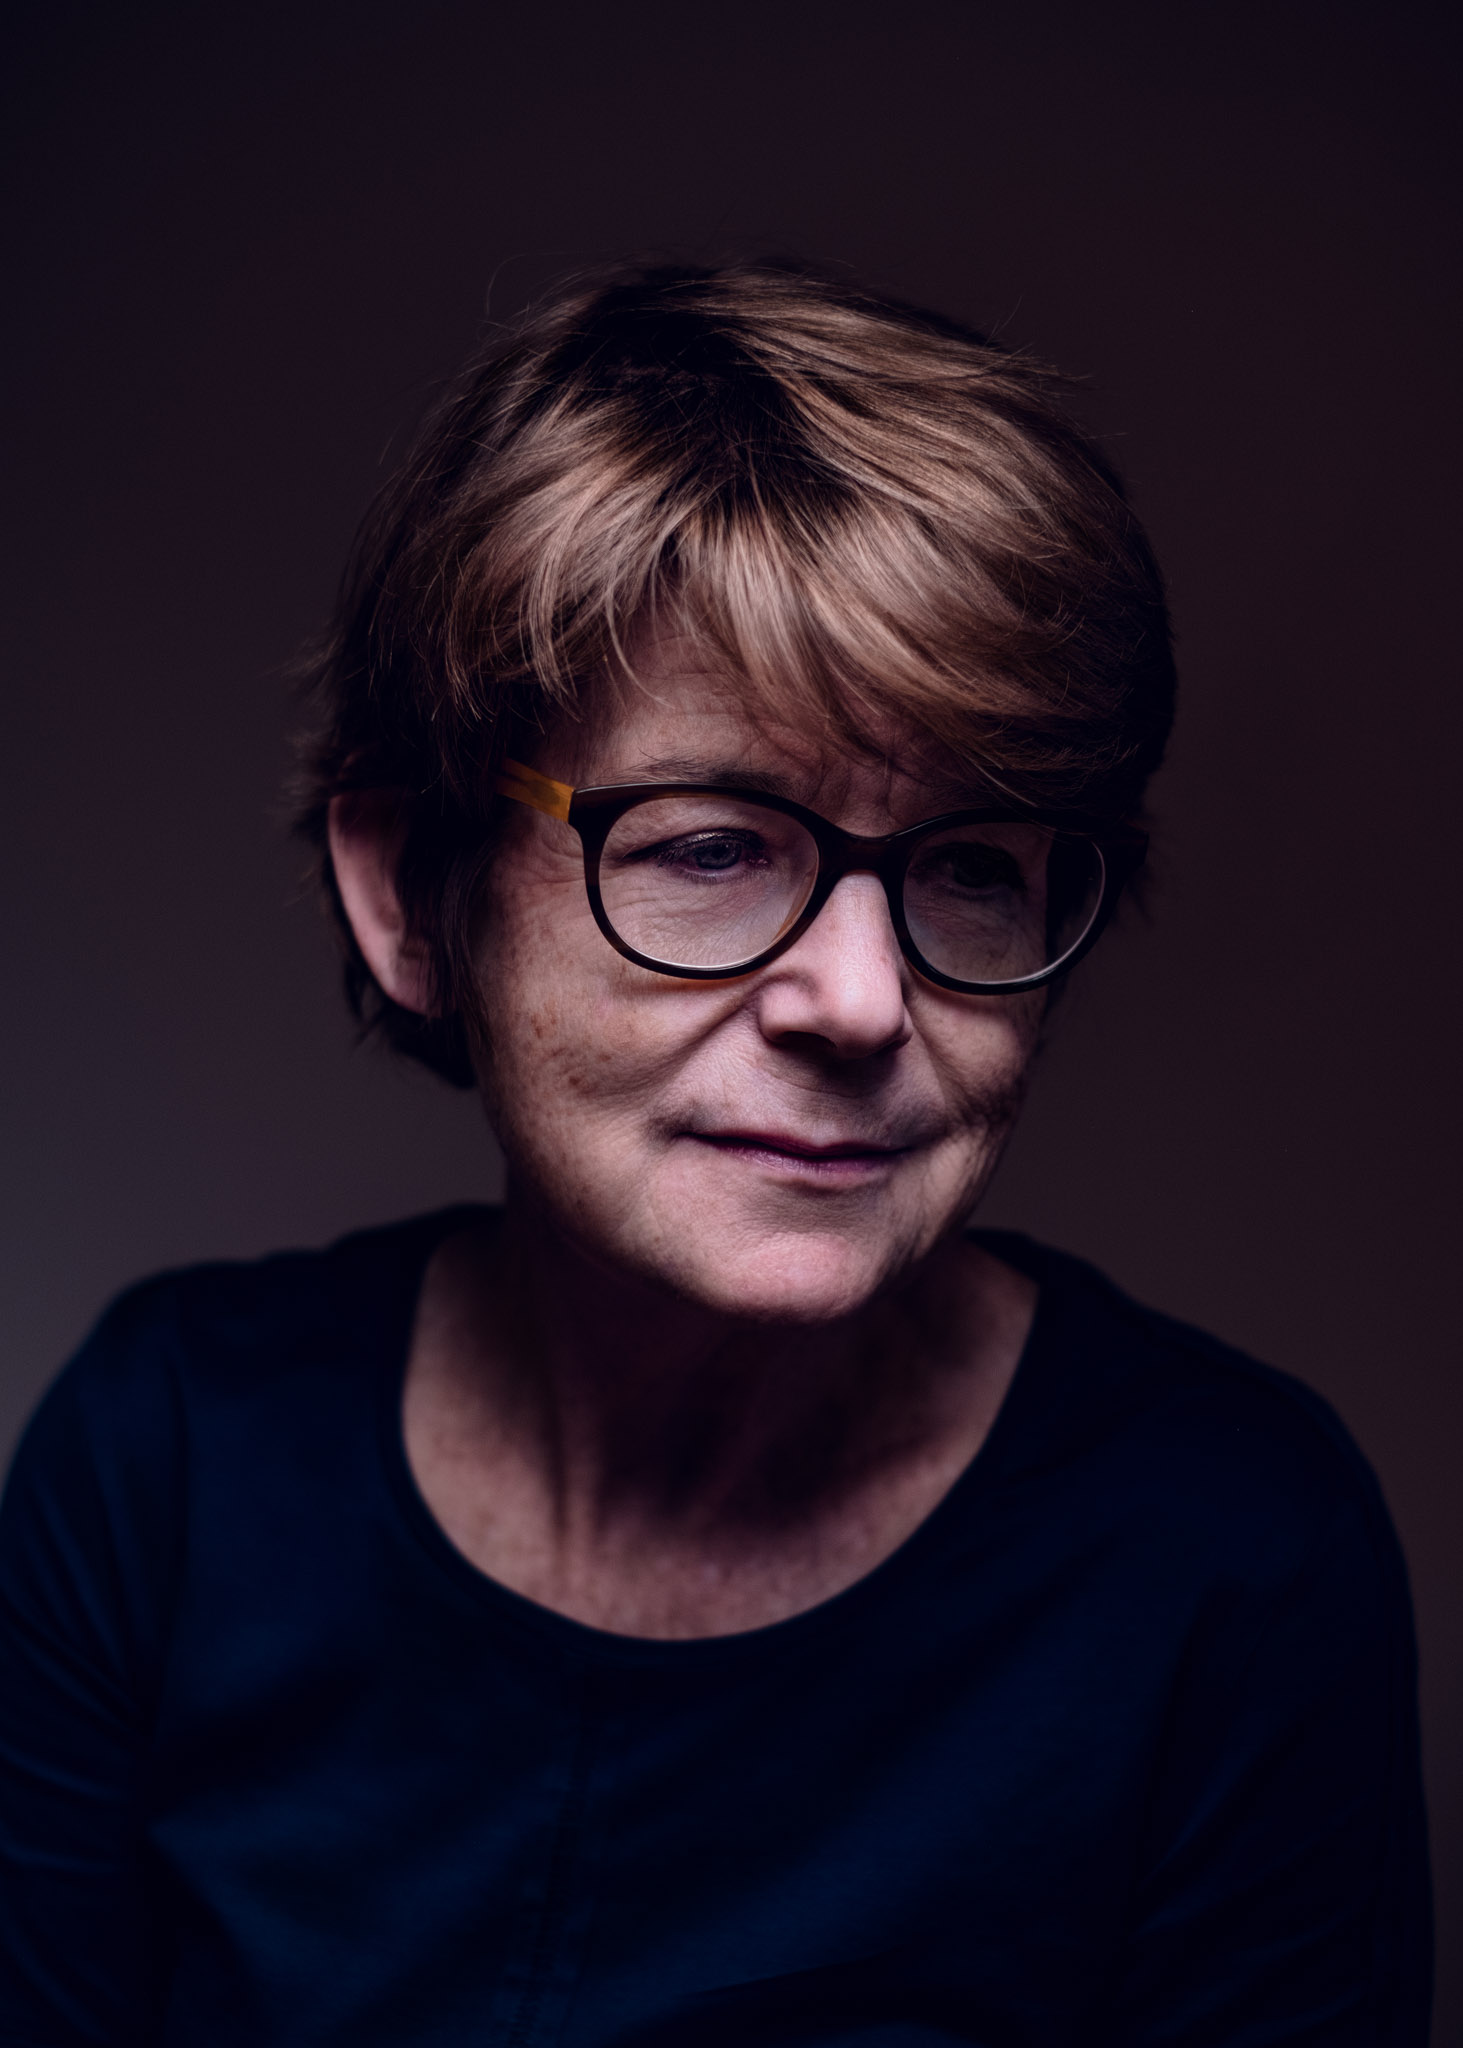 Sarah Batschelet IV, 2018